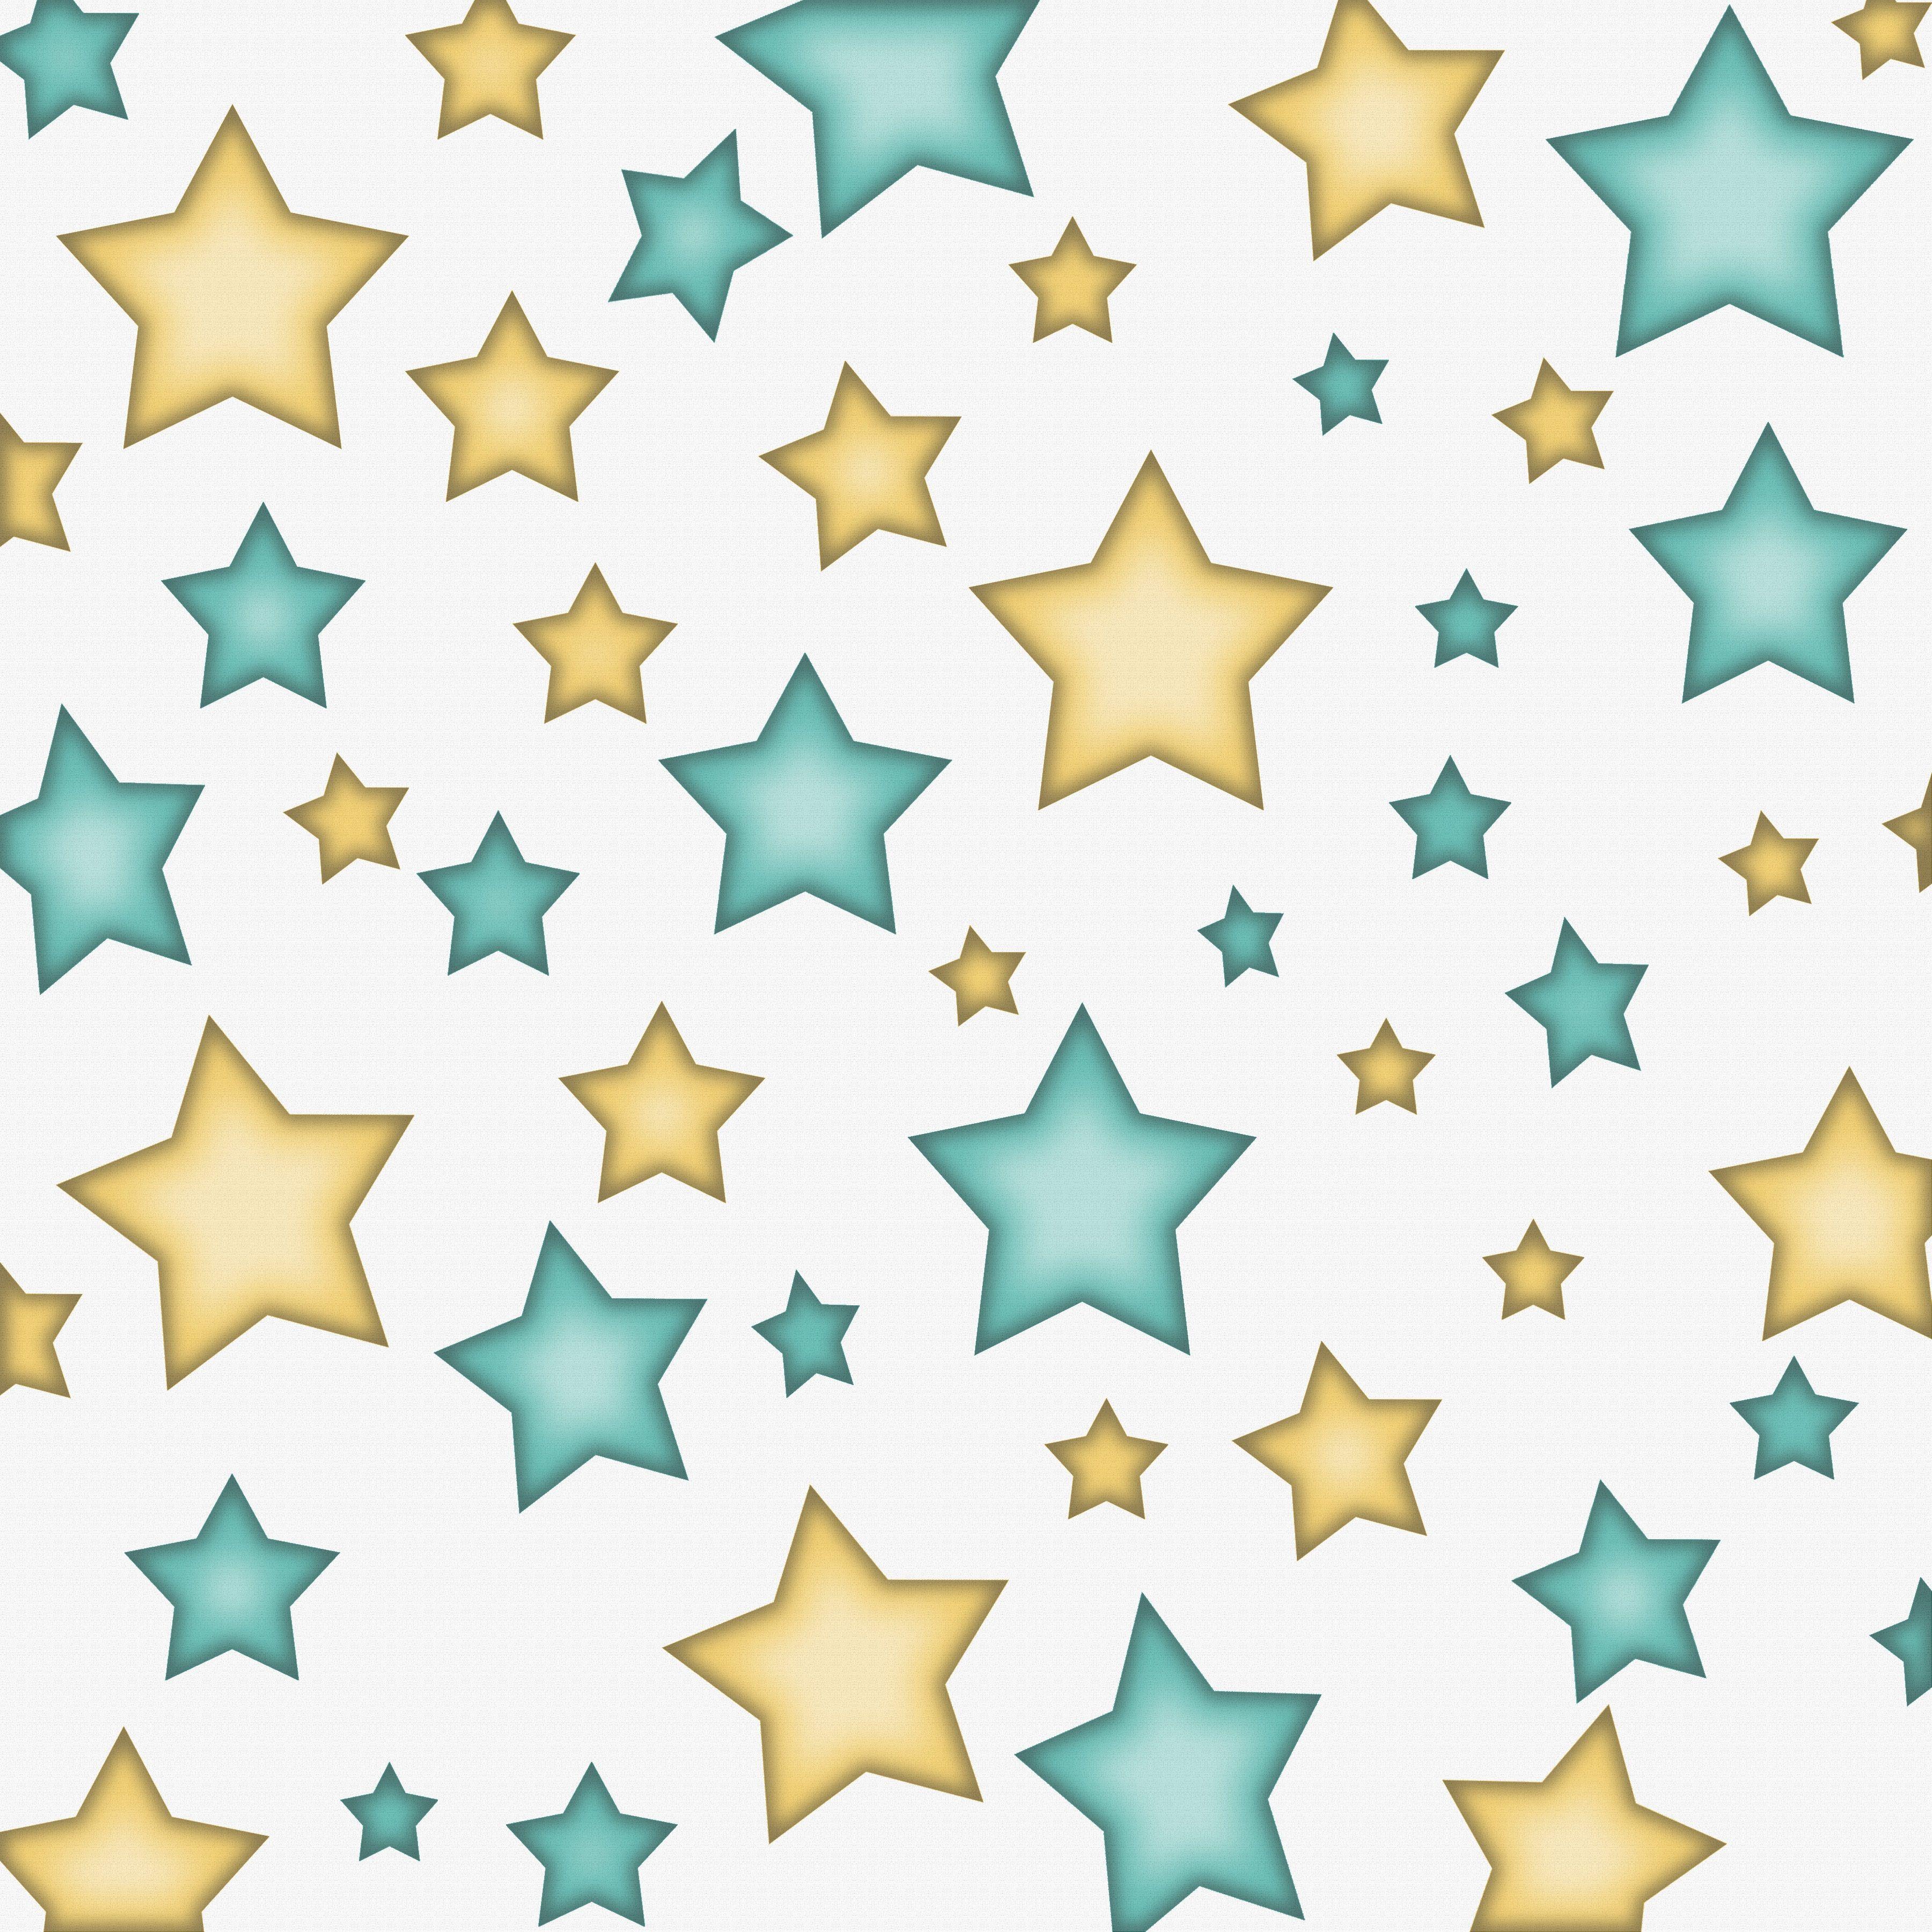 фон со звездами для метрики месте, ведь